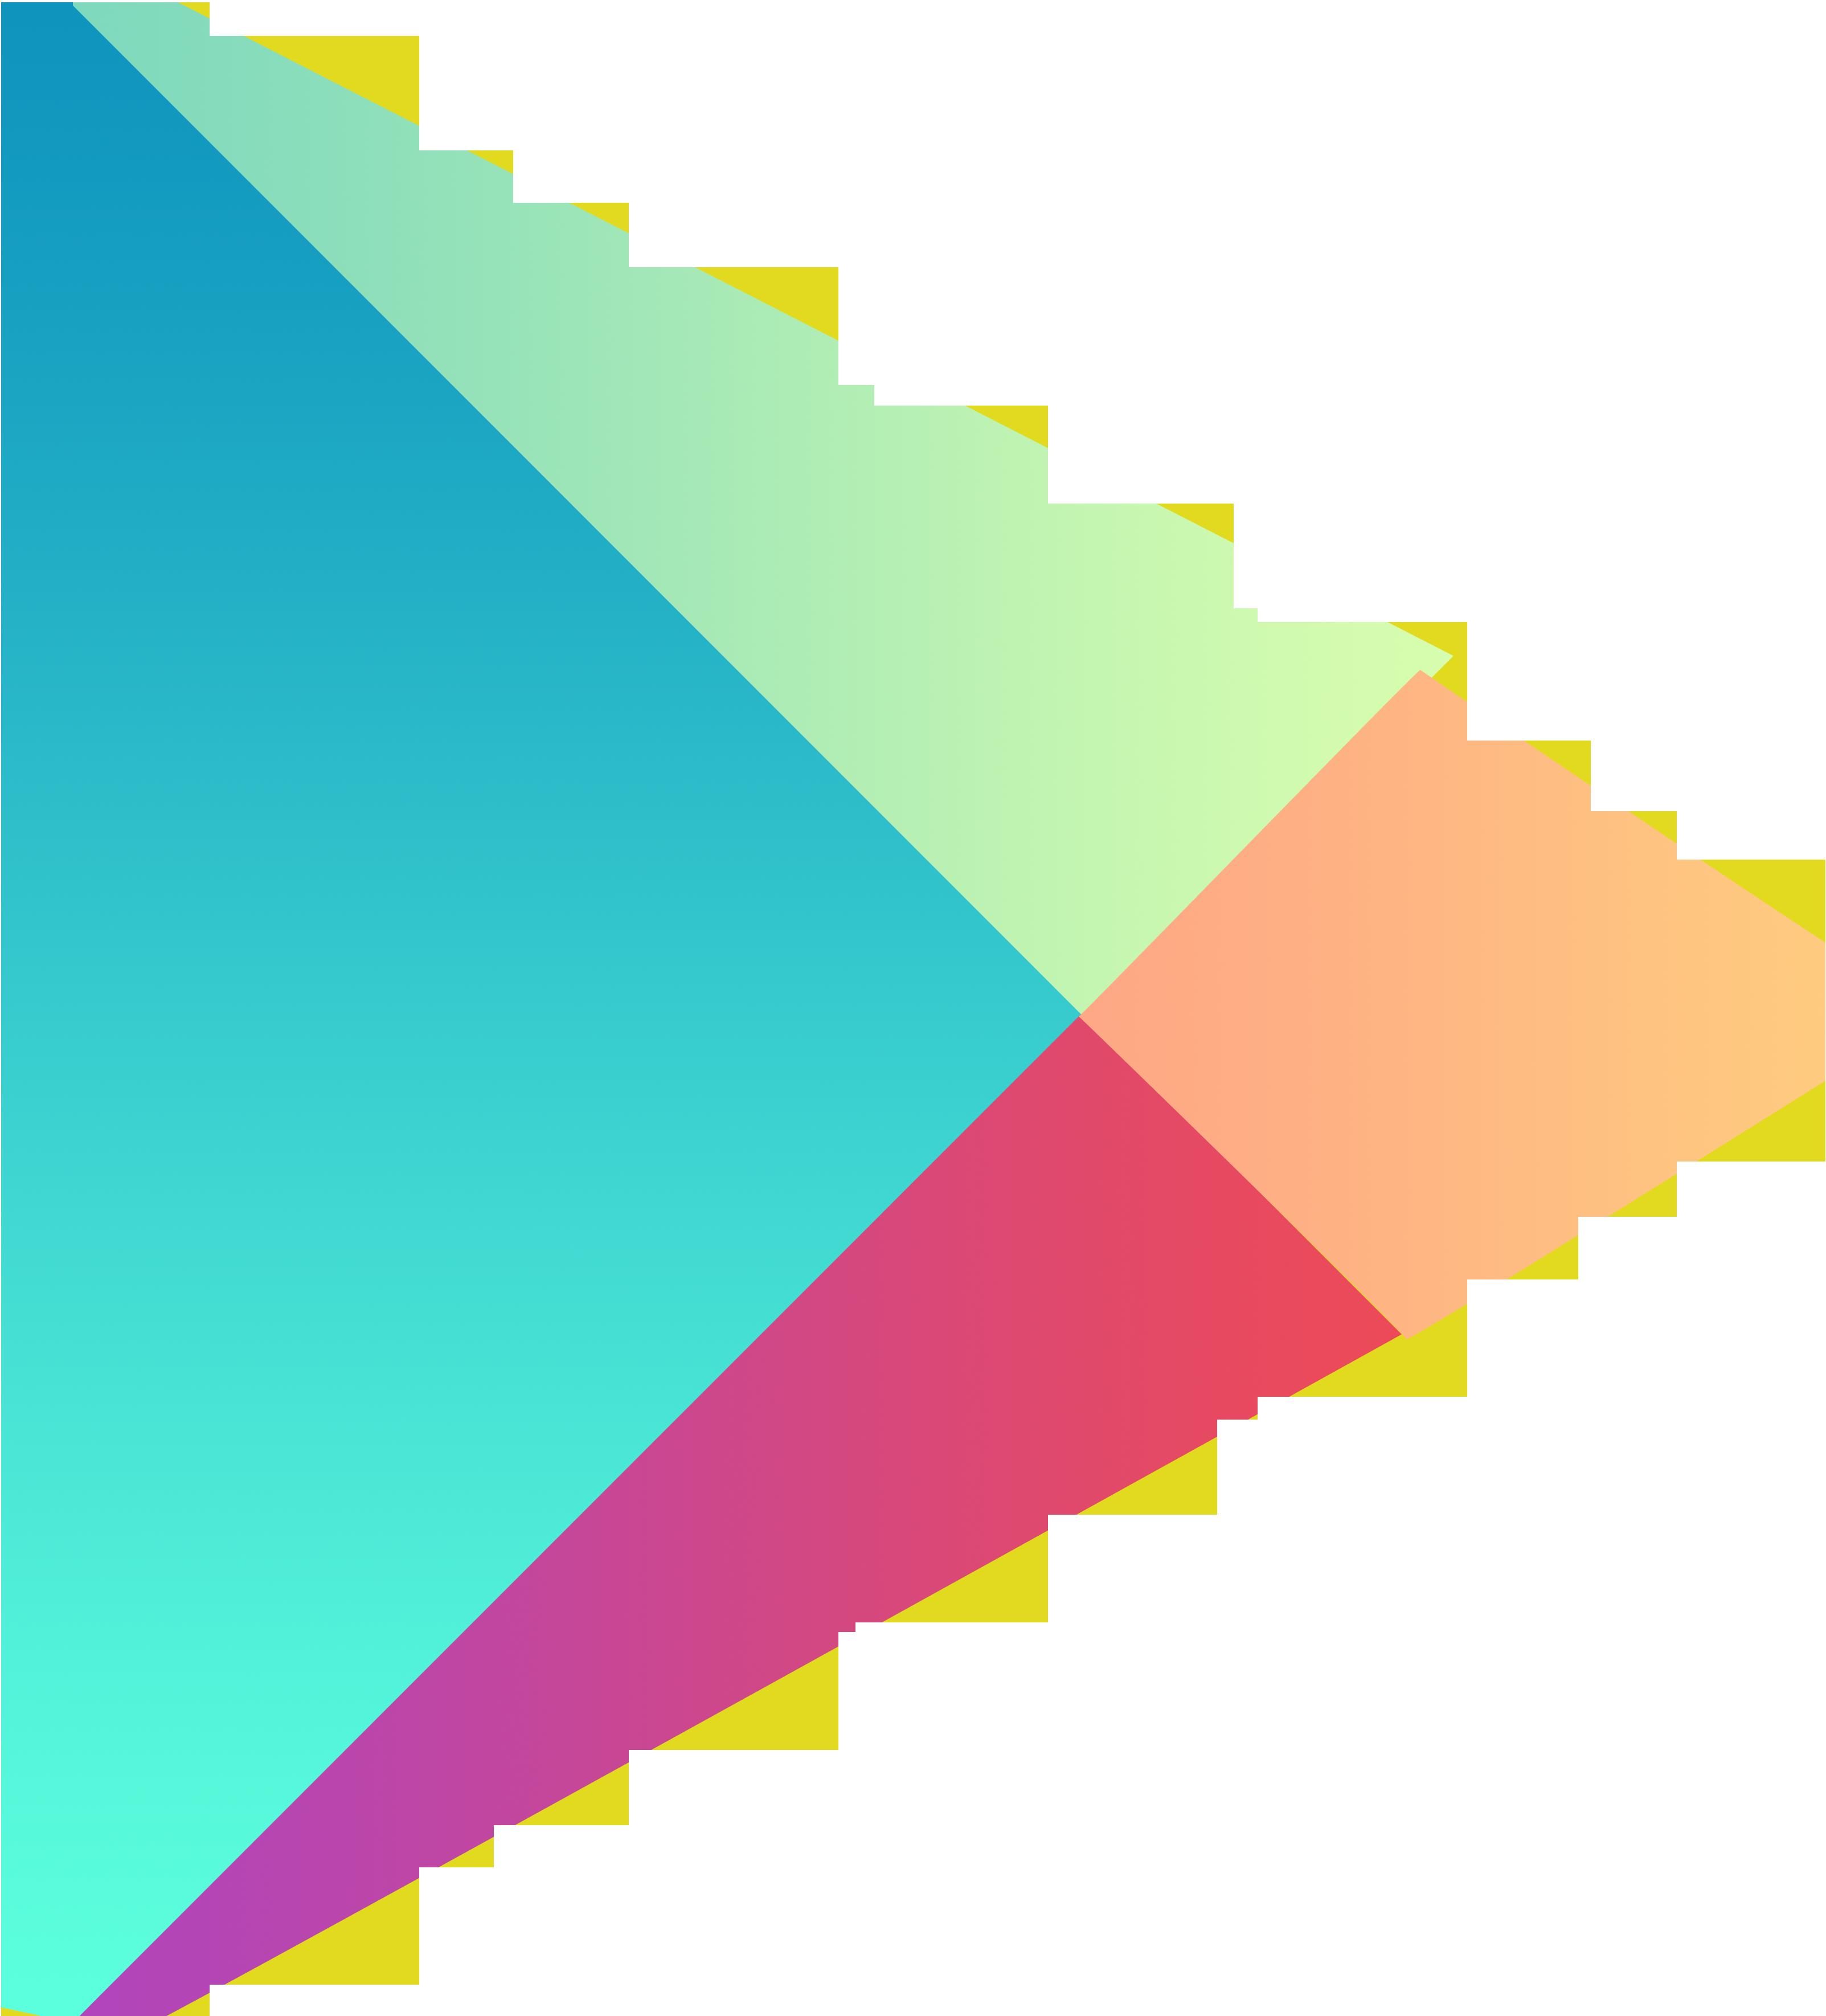 Google play logo png. Download free transparent image